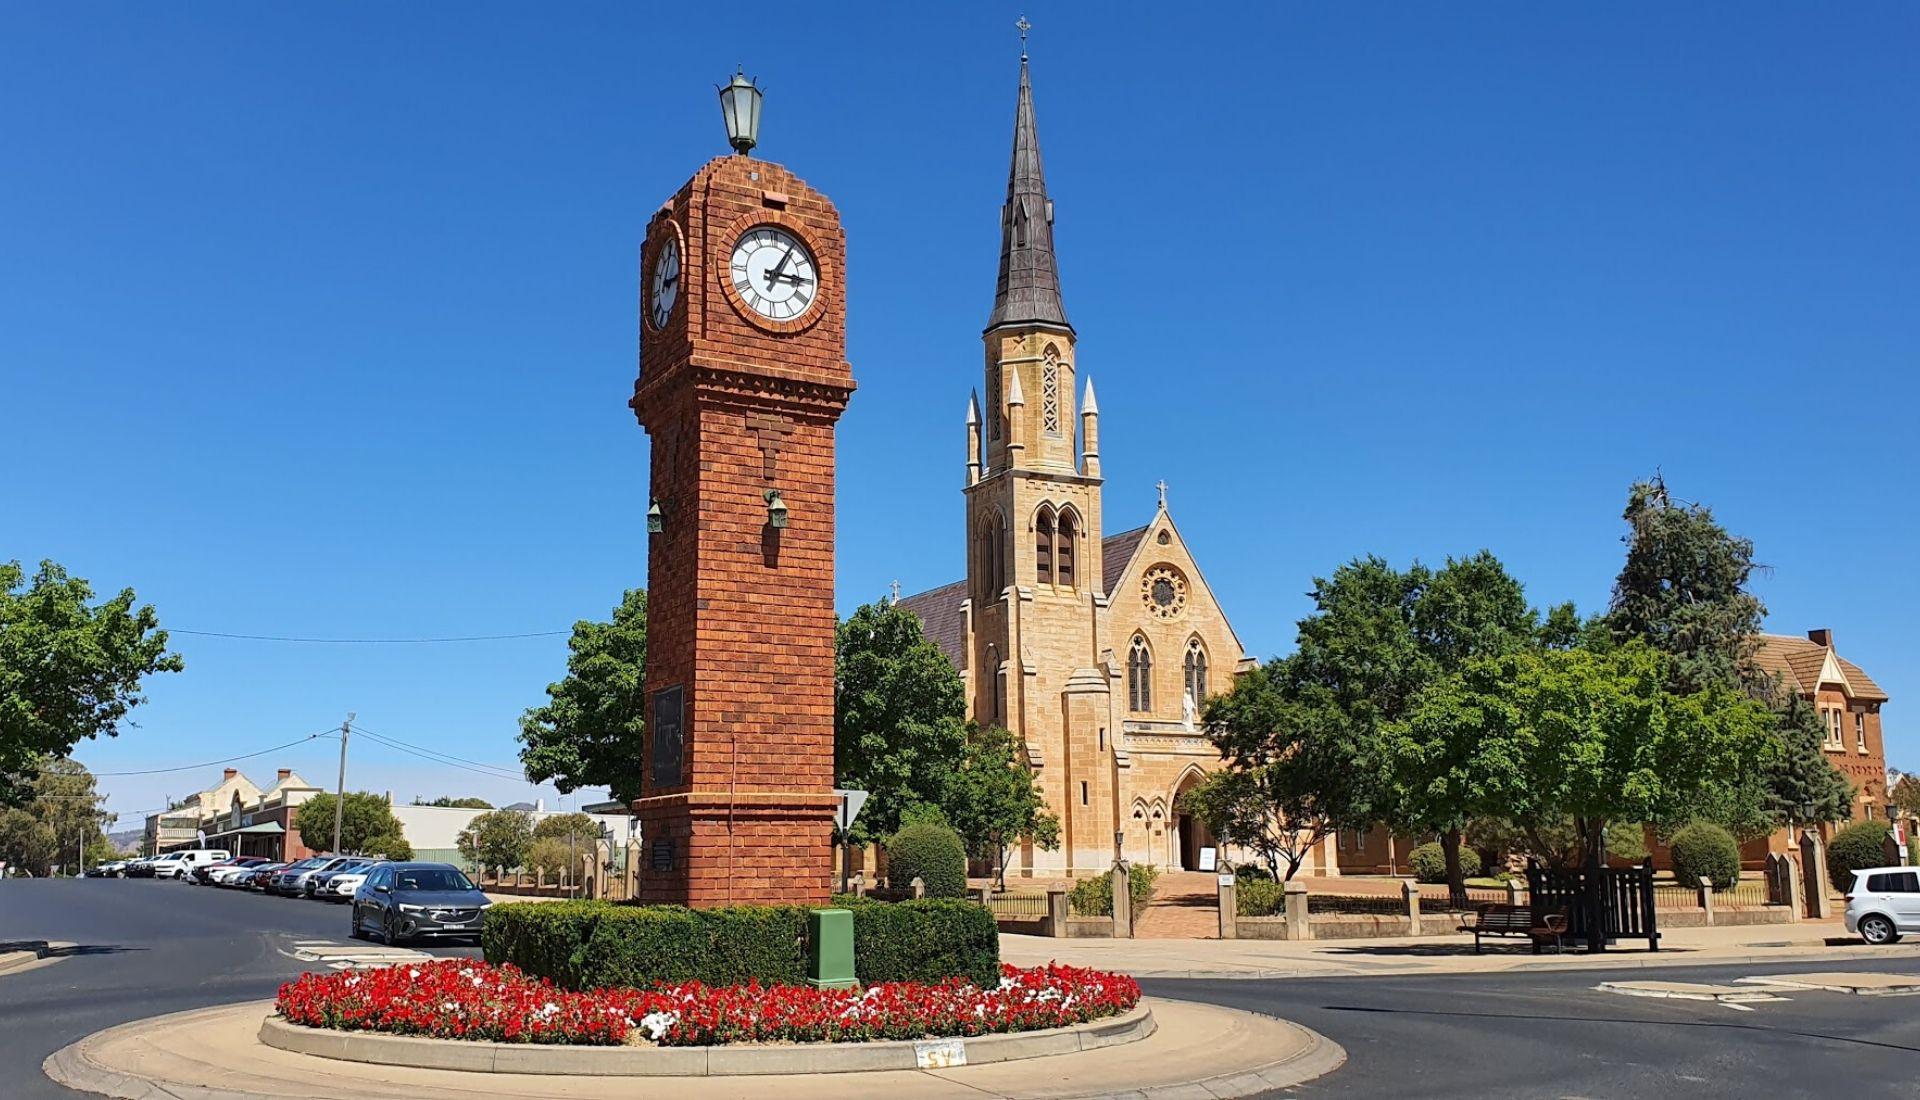 Clock Tower Mudgee